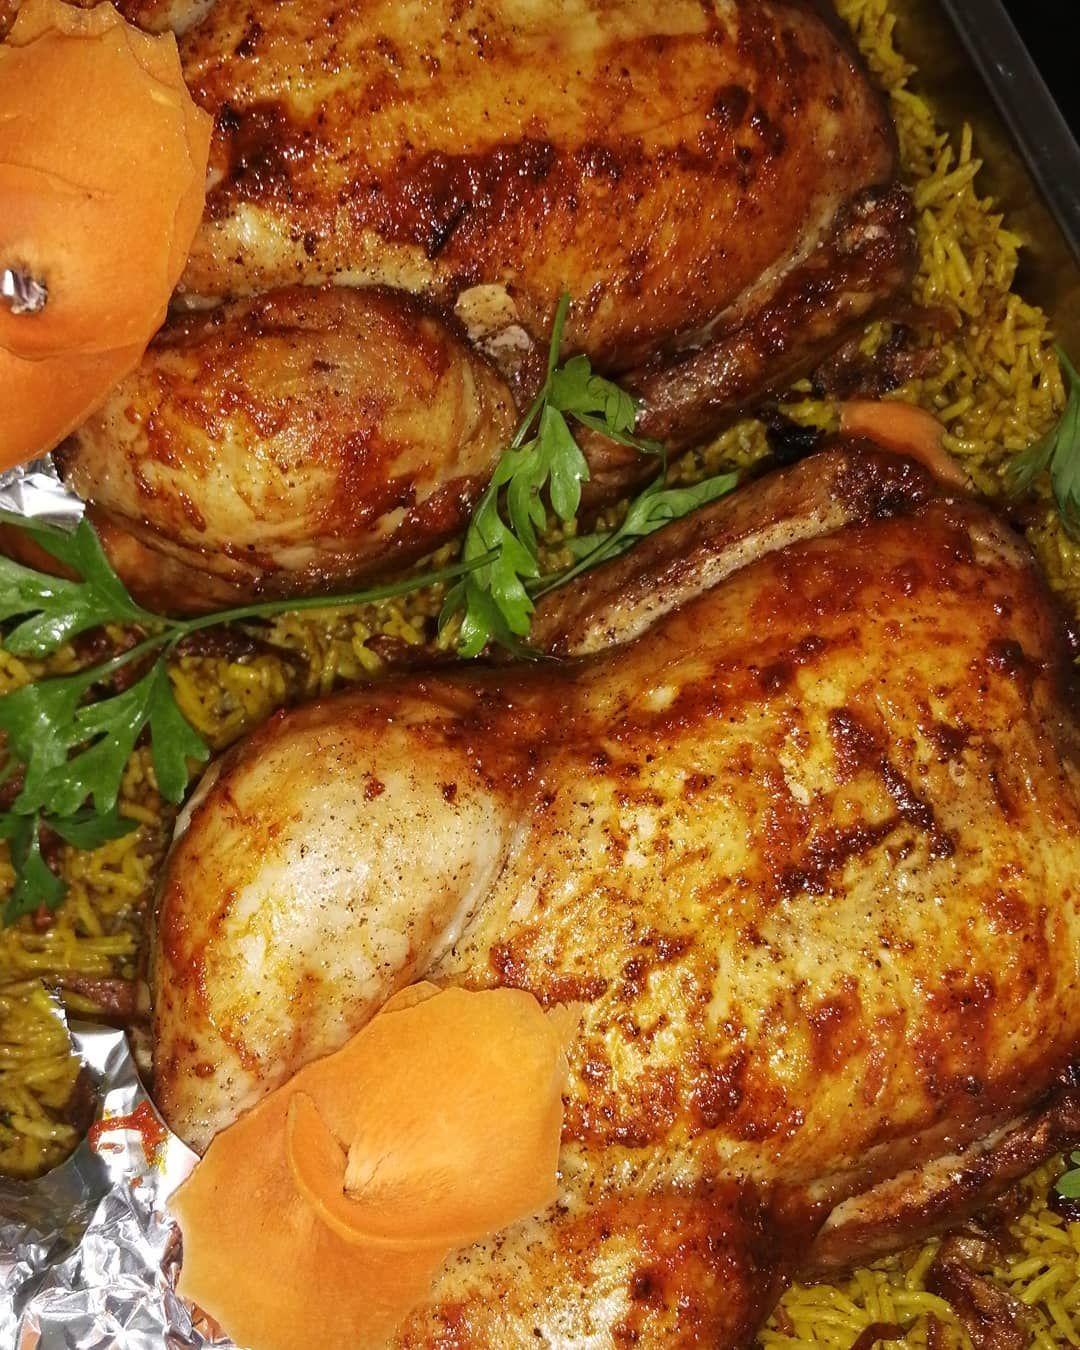 New The 10 Best Recipes With Pictures دجاج مع رز اصفر للطلب ورق عنب حلويات رمضان حلويات وصفات سهله Snabelmasrya السعودية اكلات Recipes Food Turkey